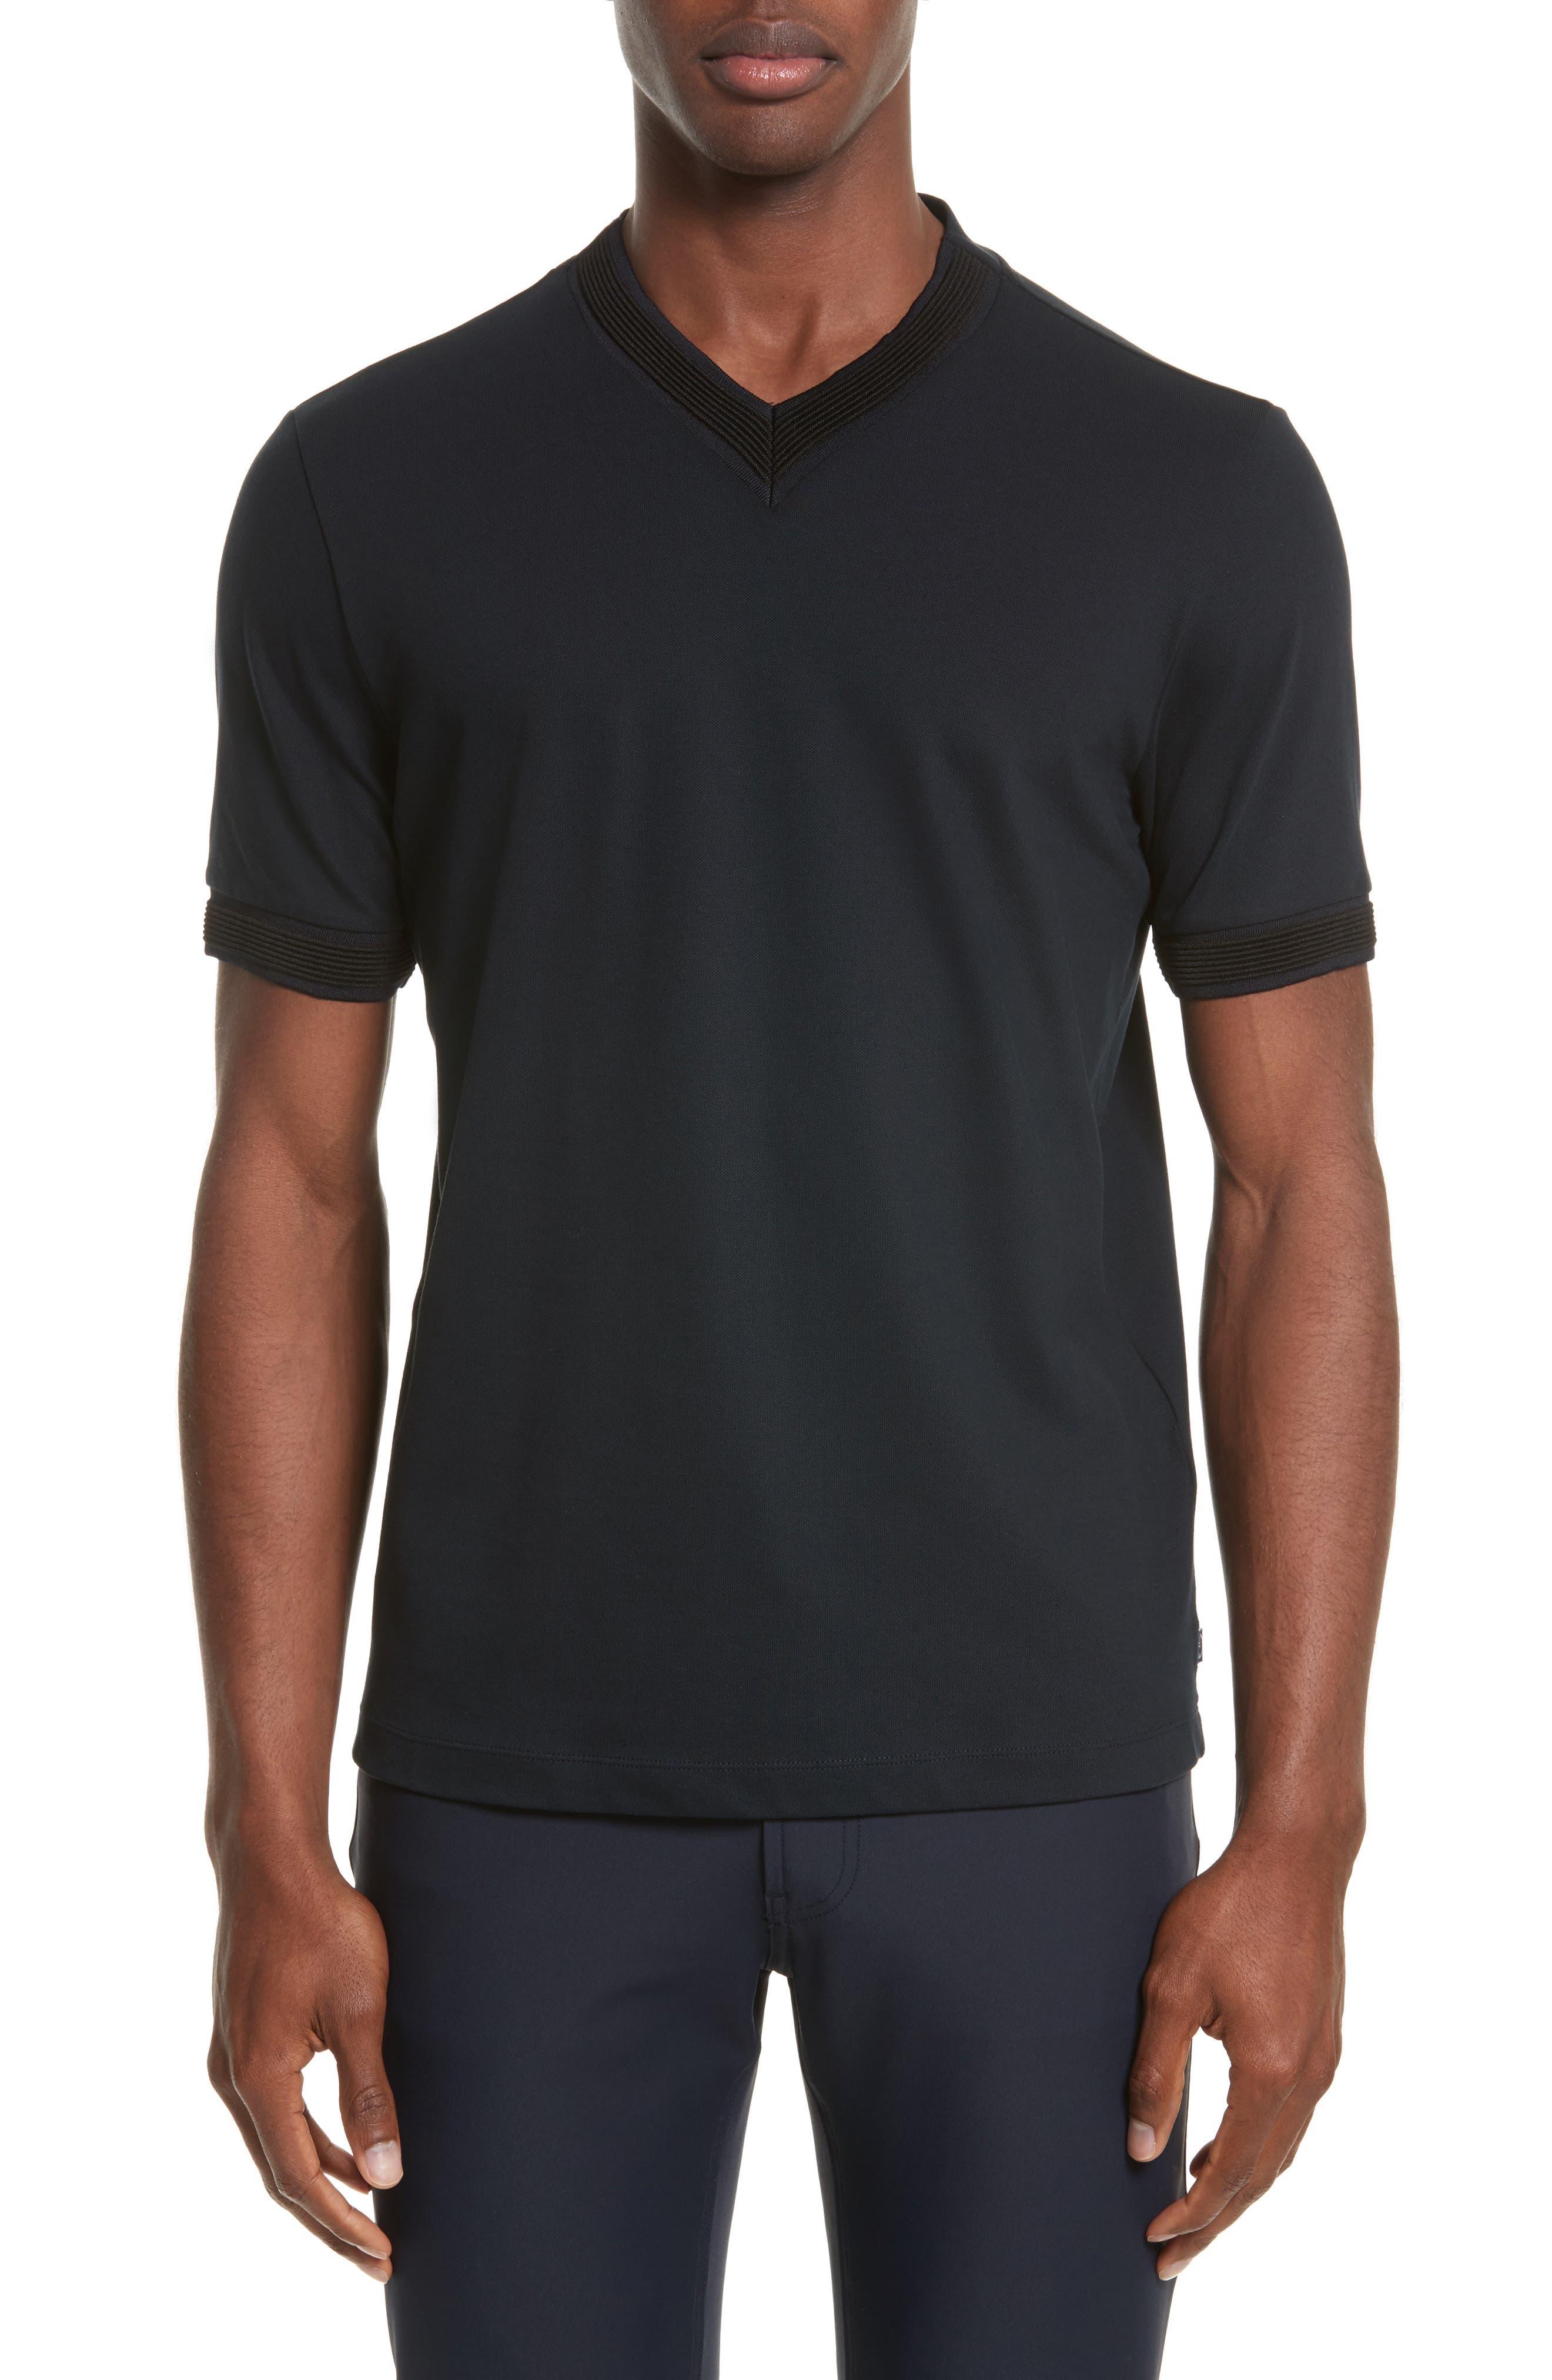 Alternate Image 1 Selected - Armani Collezioni Ribbed V-Neck T-Shirt